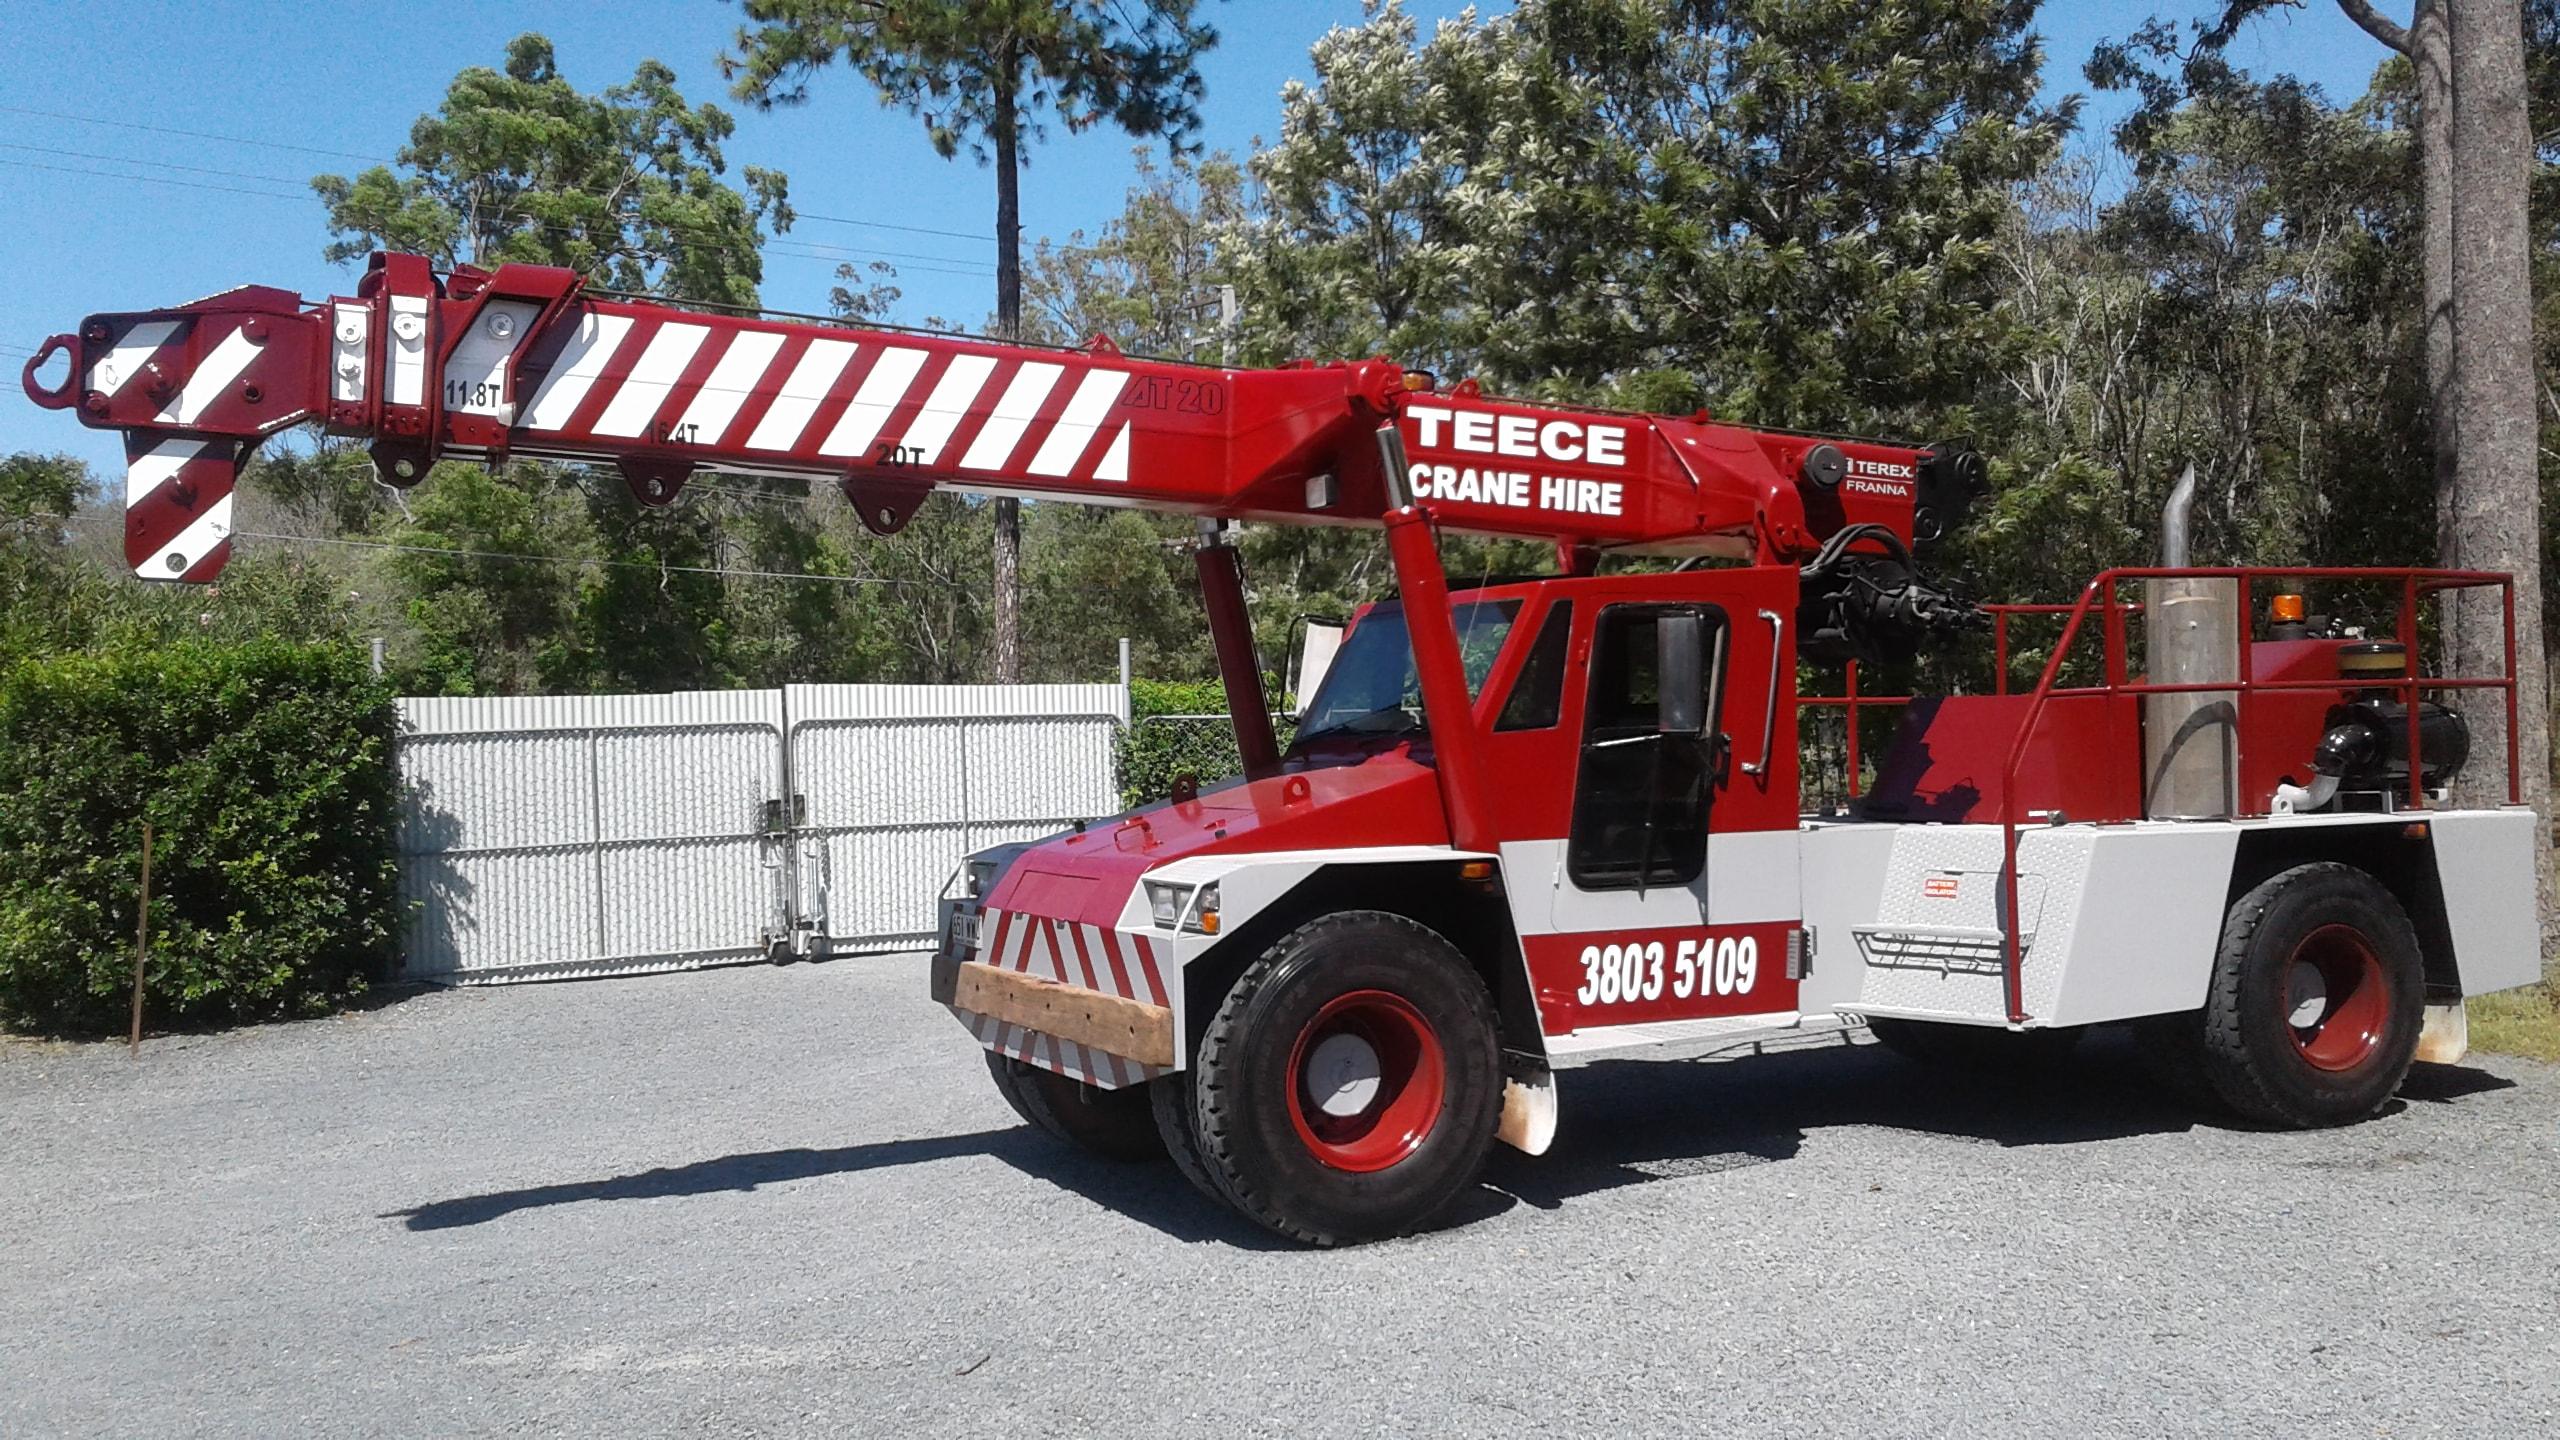 Teece Crane Hire - Franna And Mobile Crane Rental - Brisbane